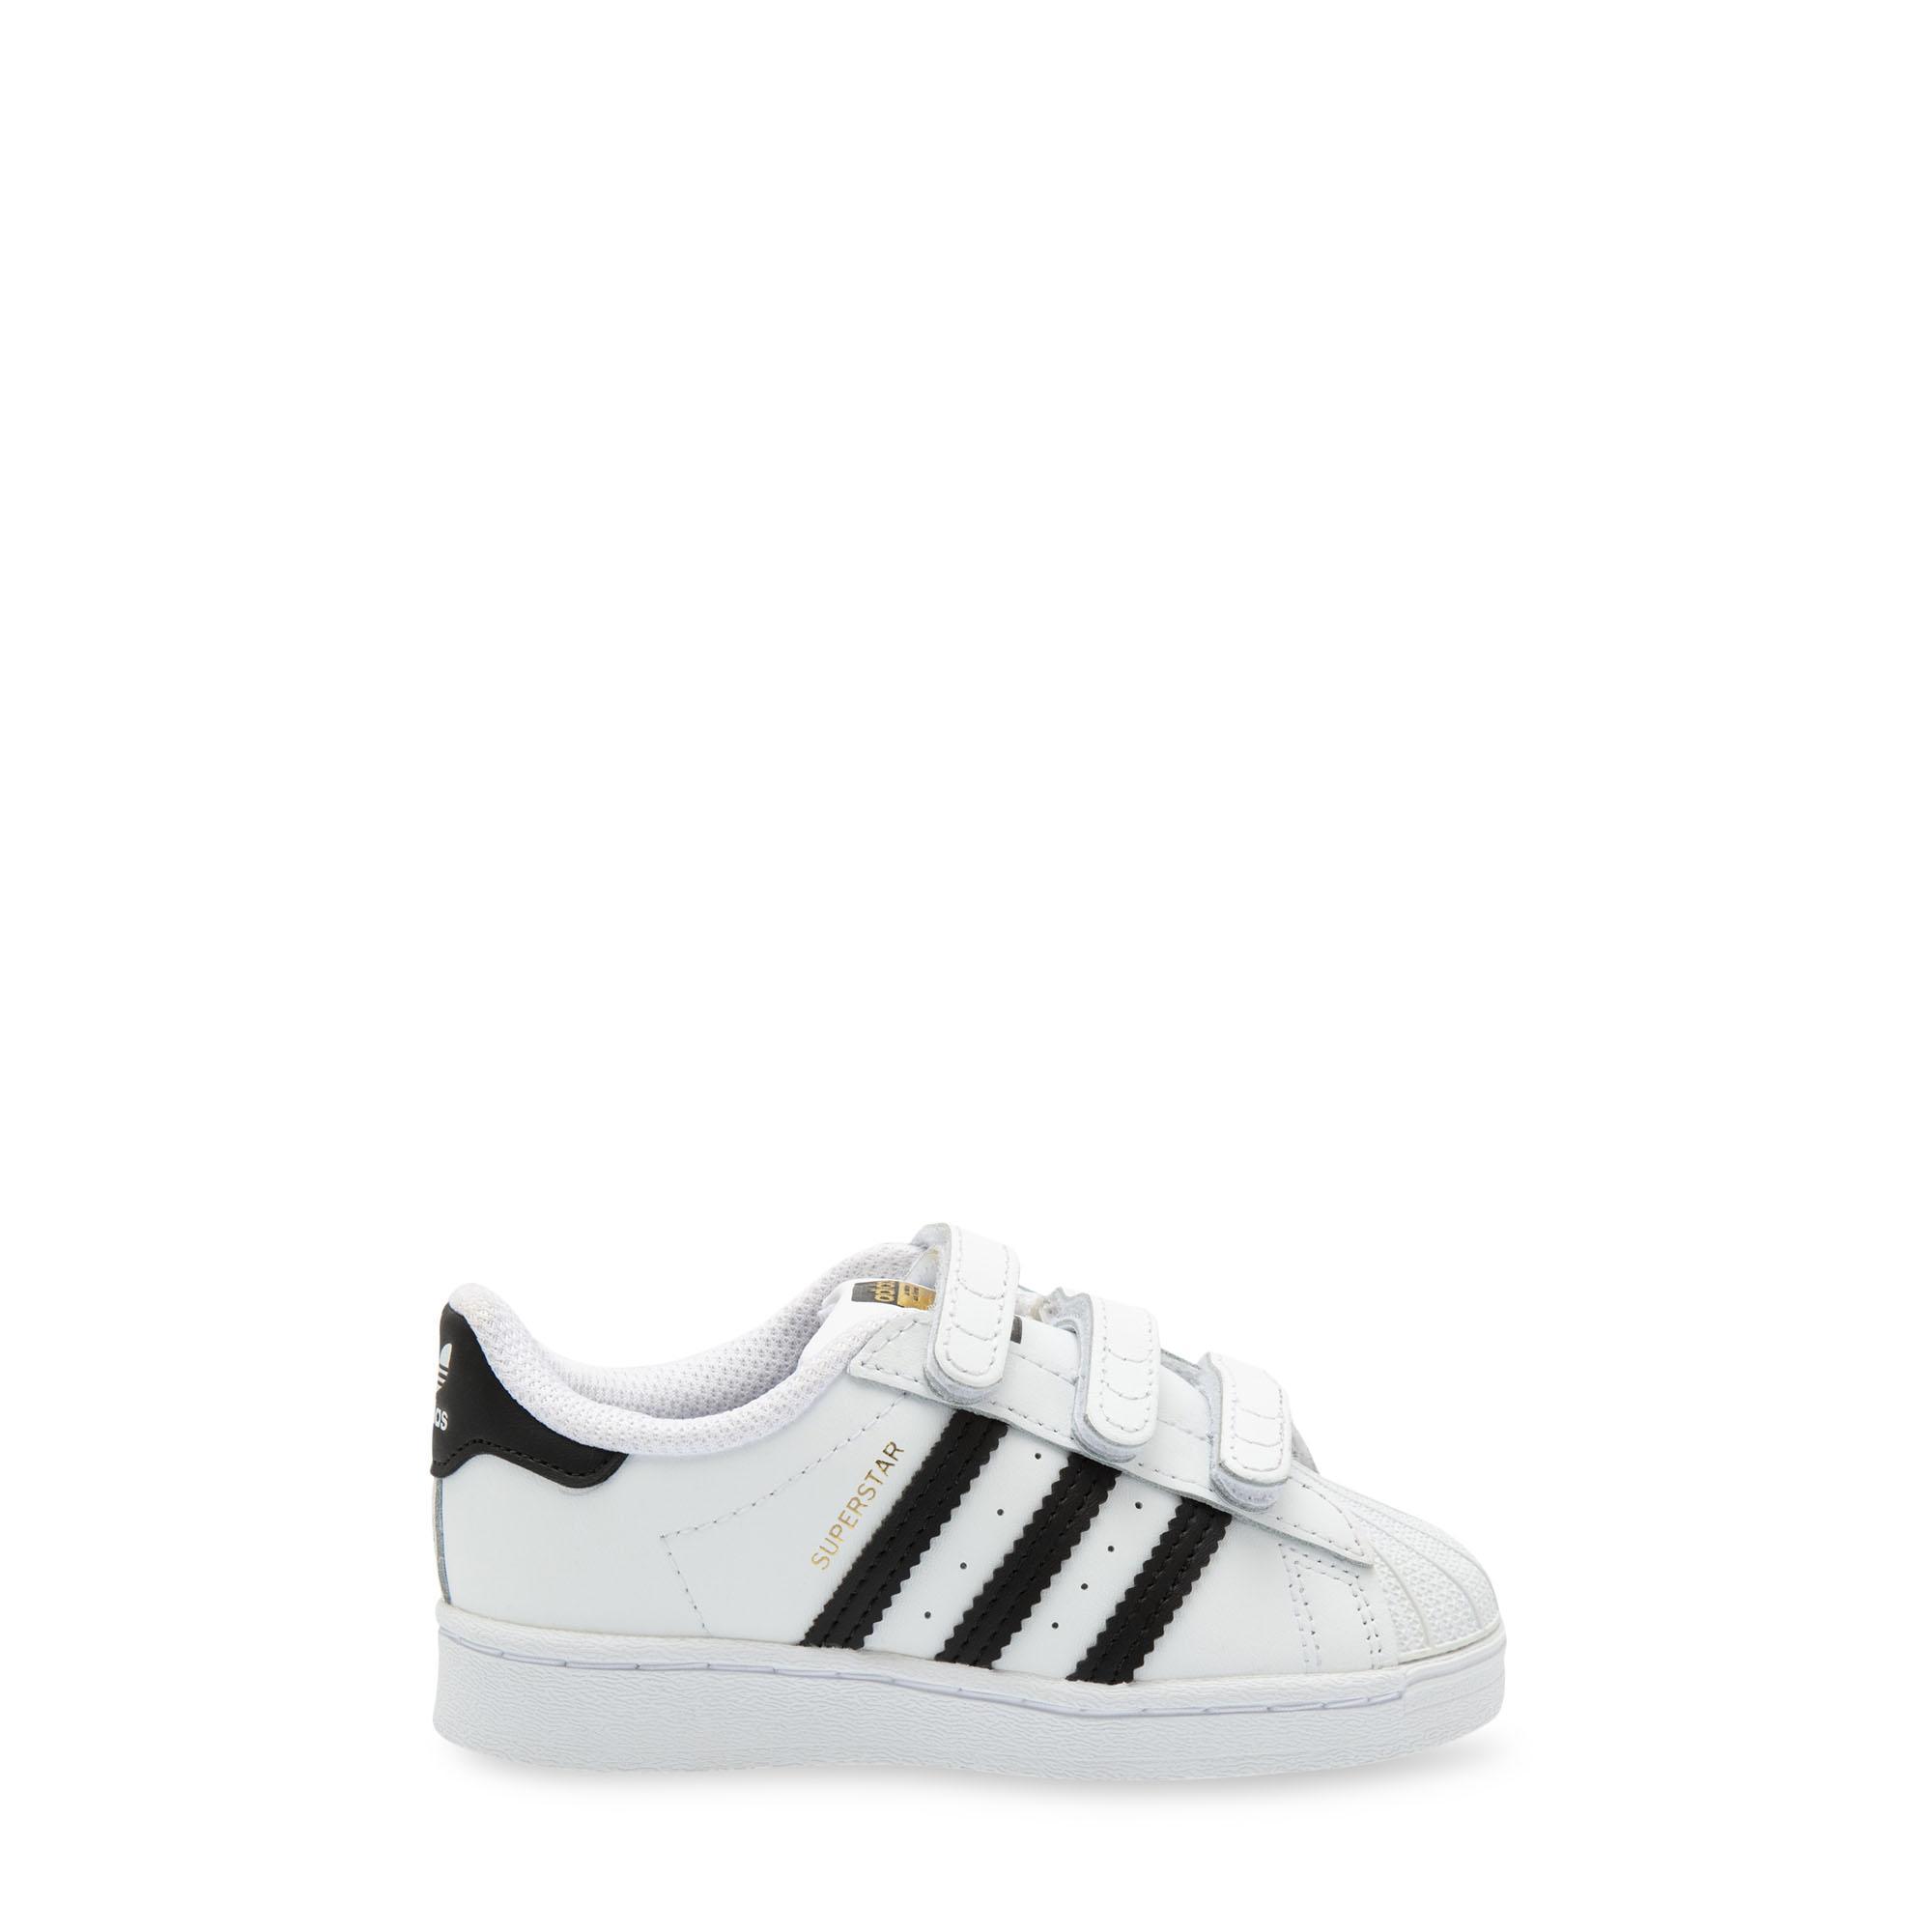 Superstar CF sneakers